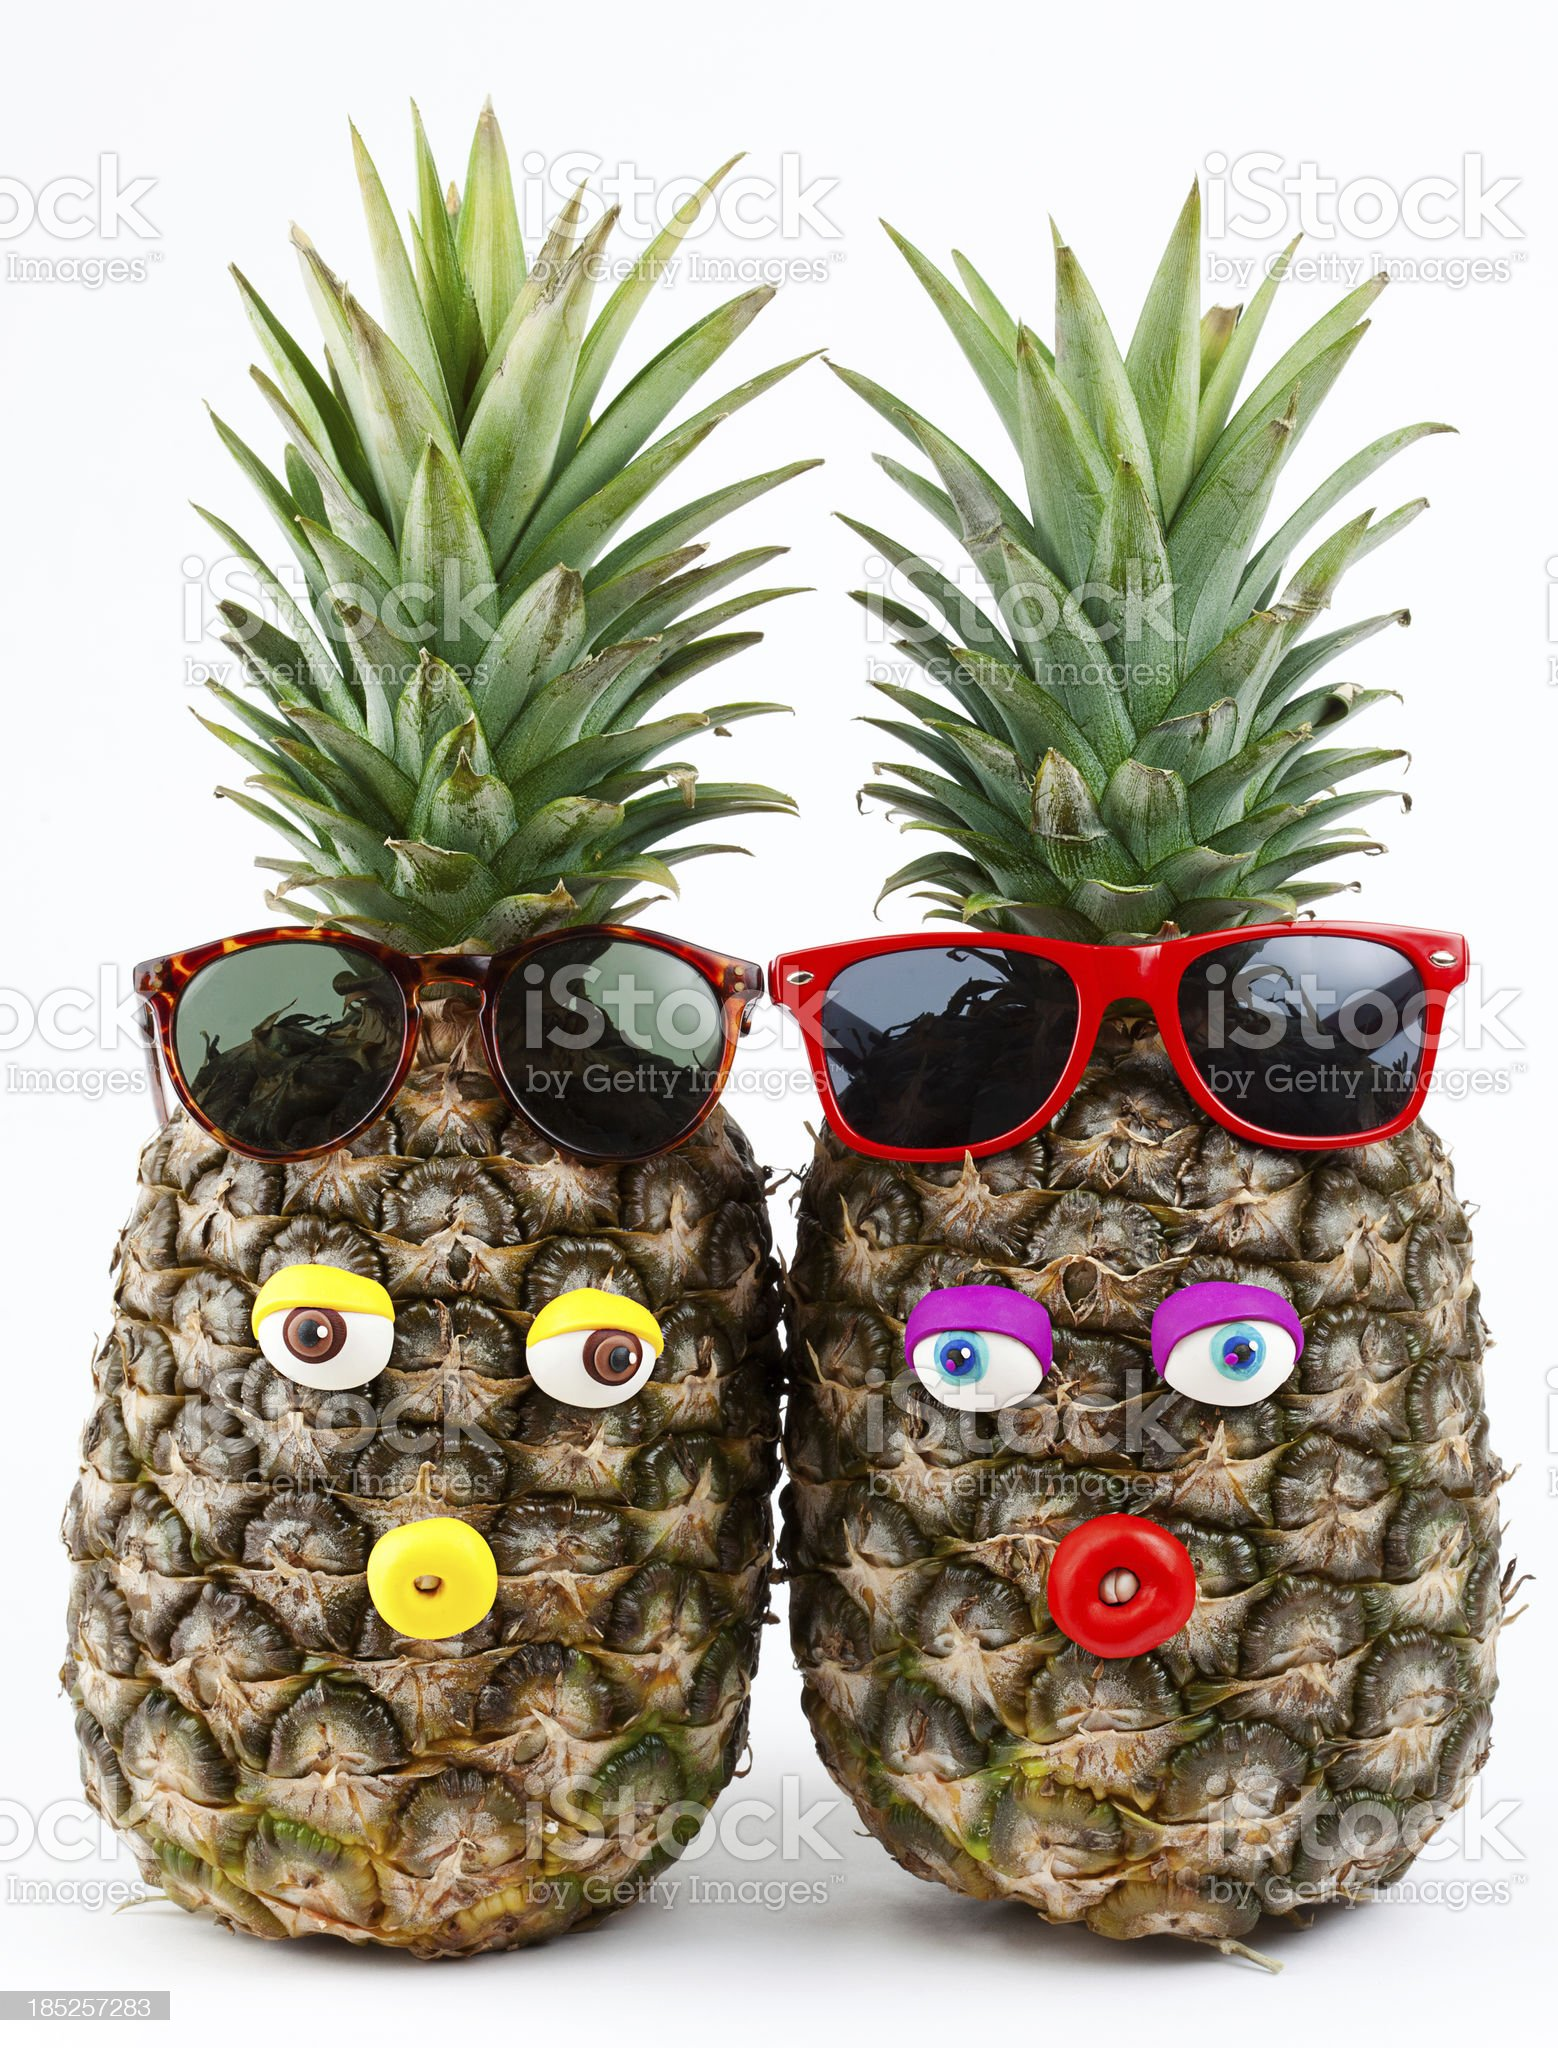 Pineapples portrait royalty-free stock photo